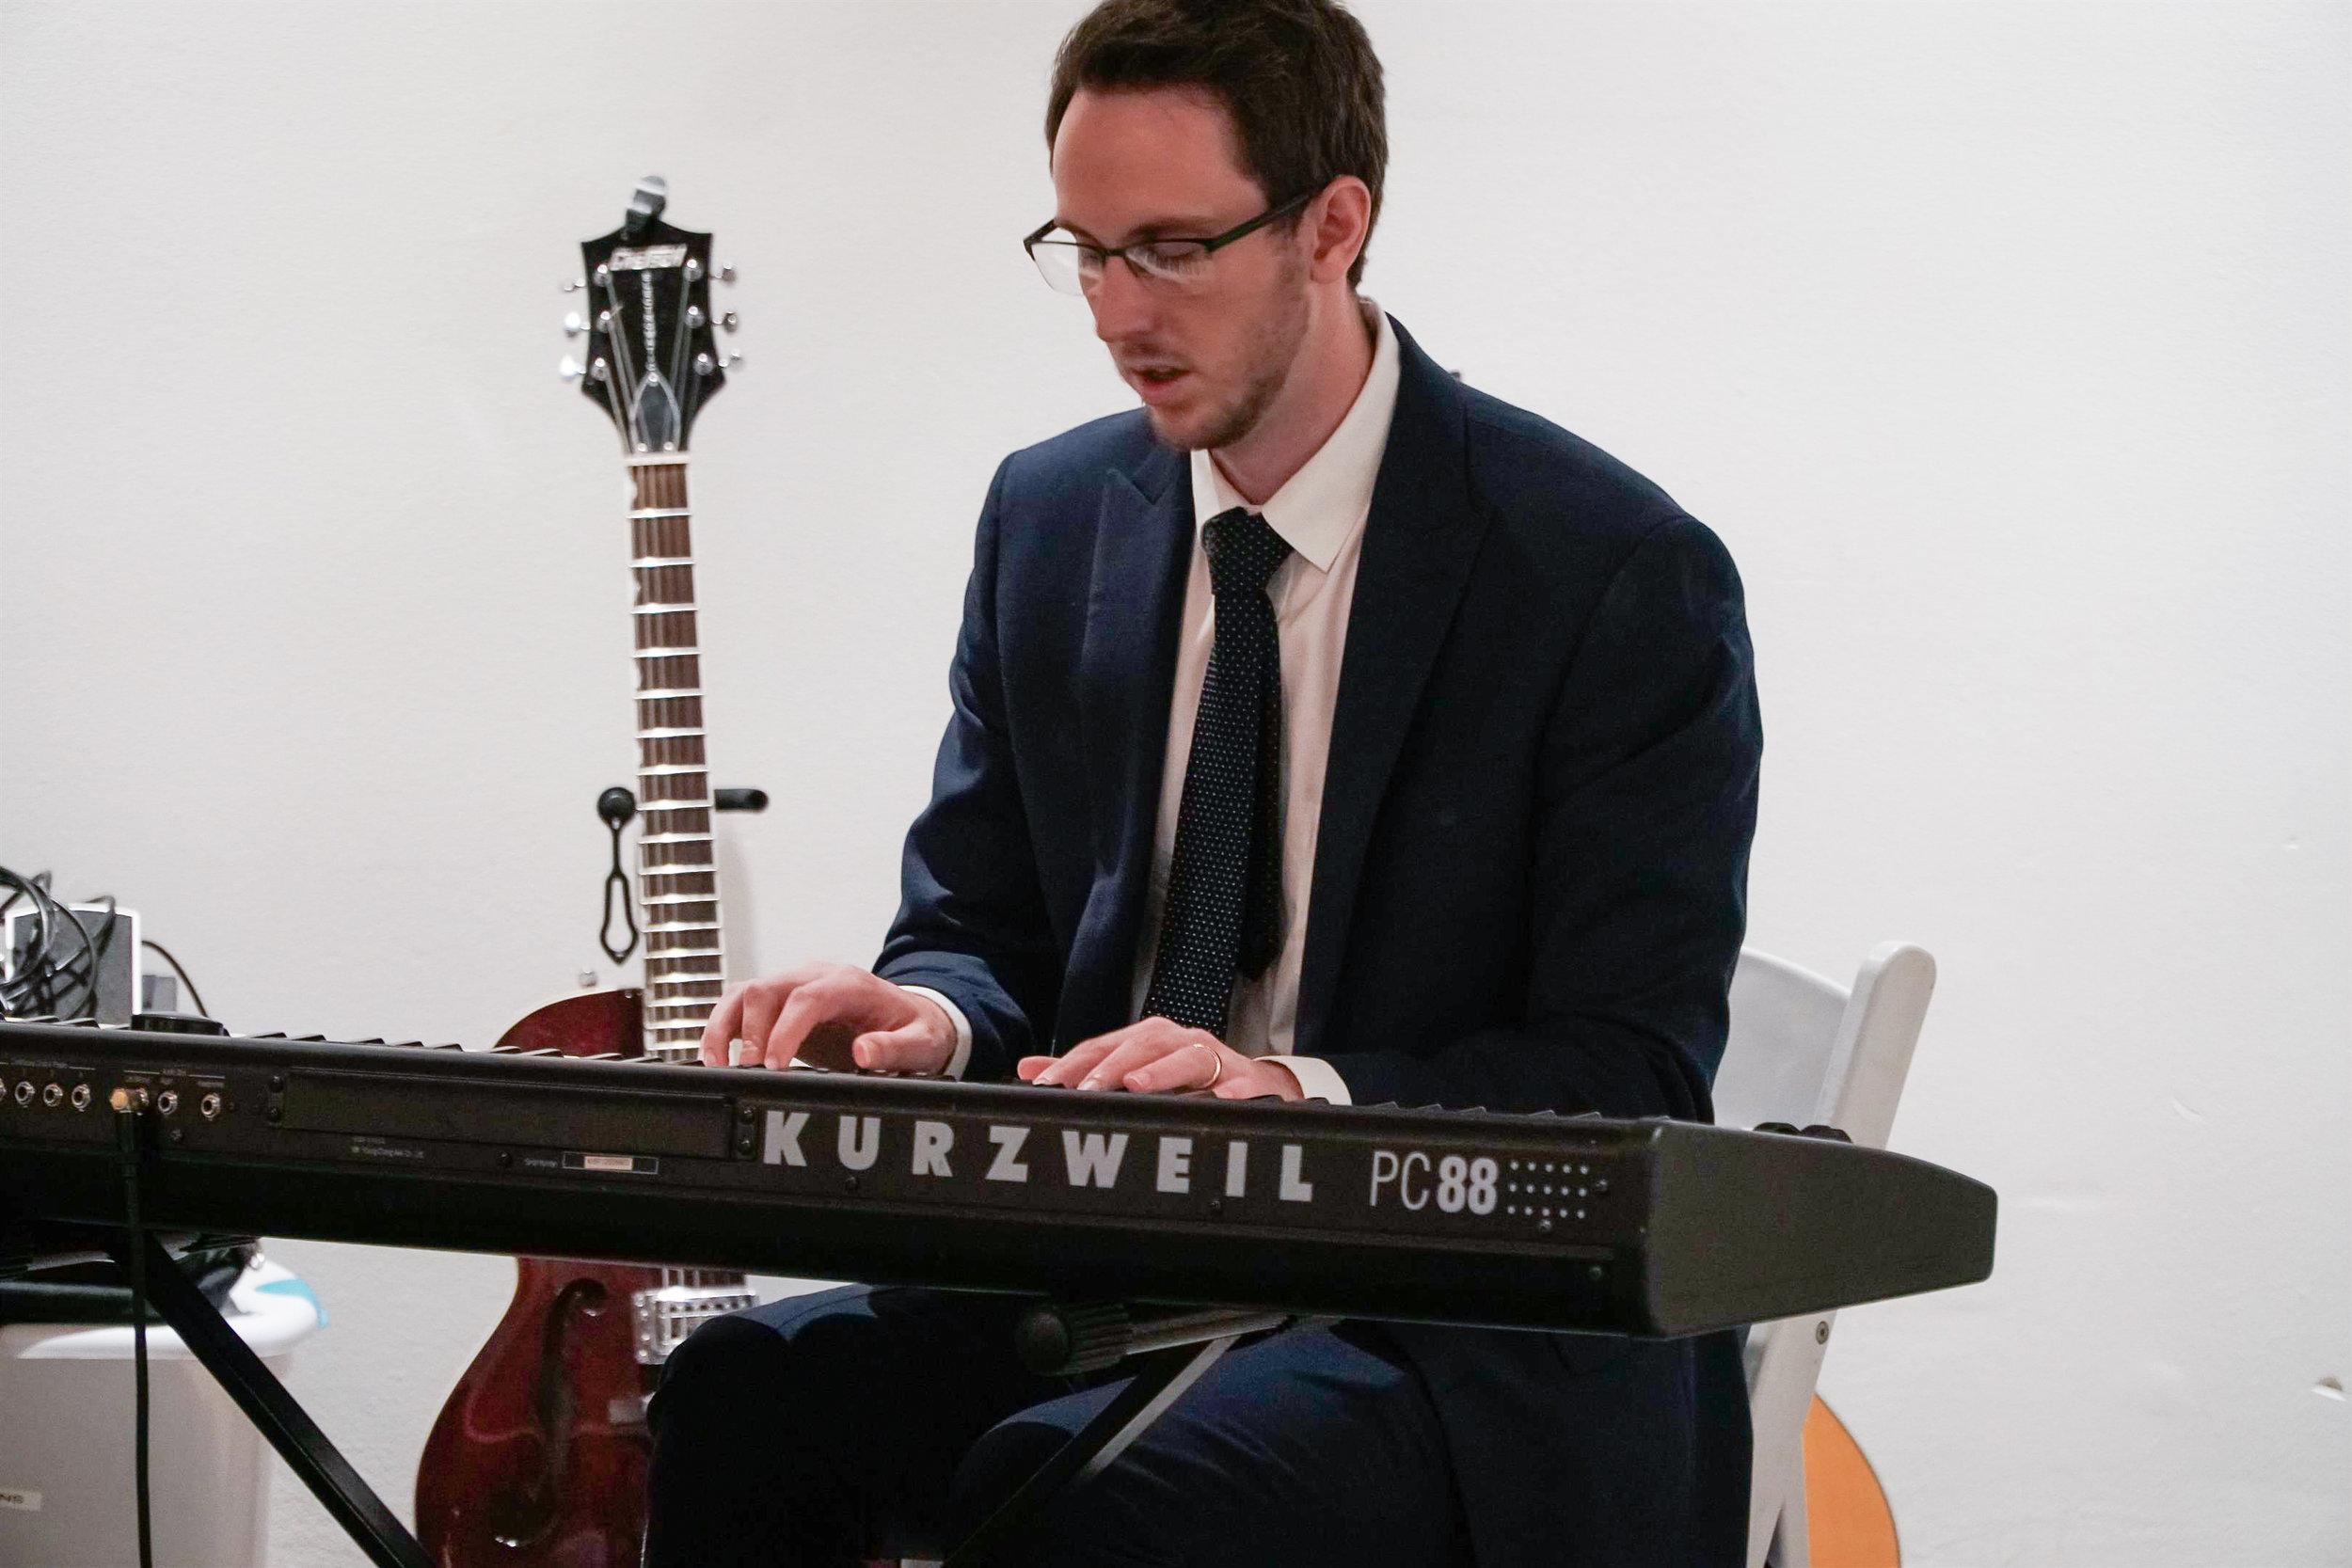 Musician playing keyboard during dinner